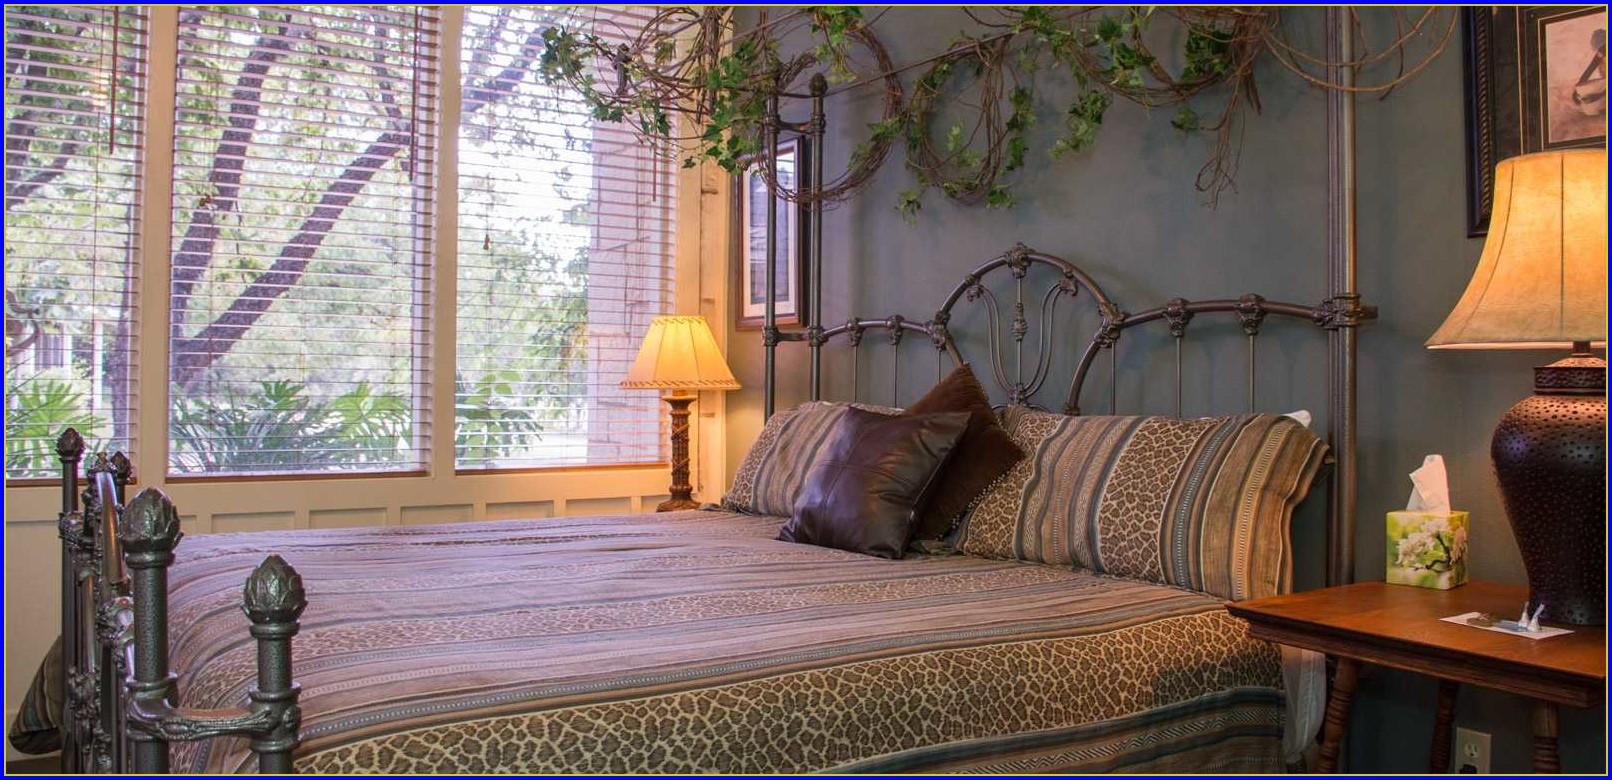 Bed And Breakfast Fredericksburg Tx Hot Tub